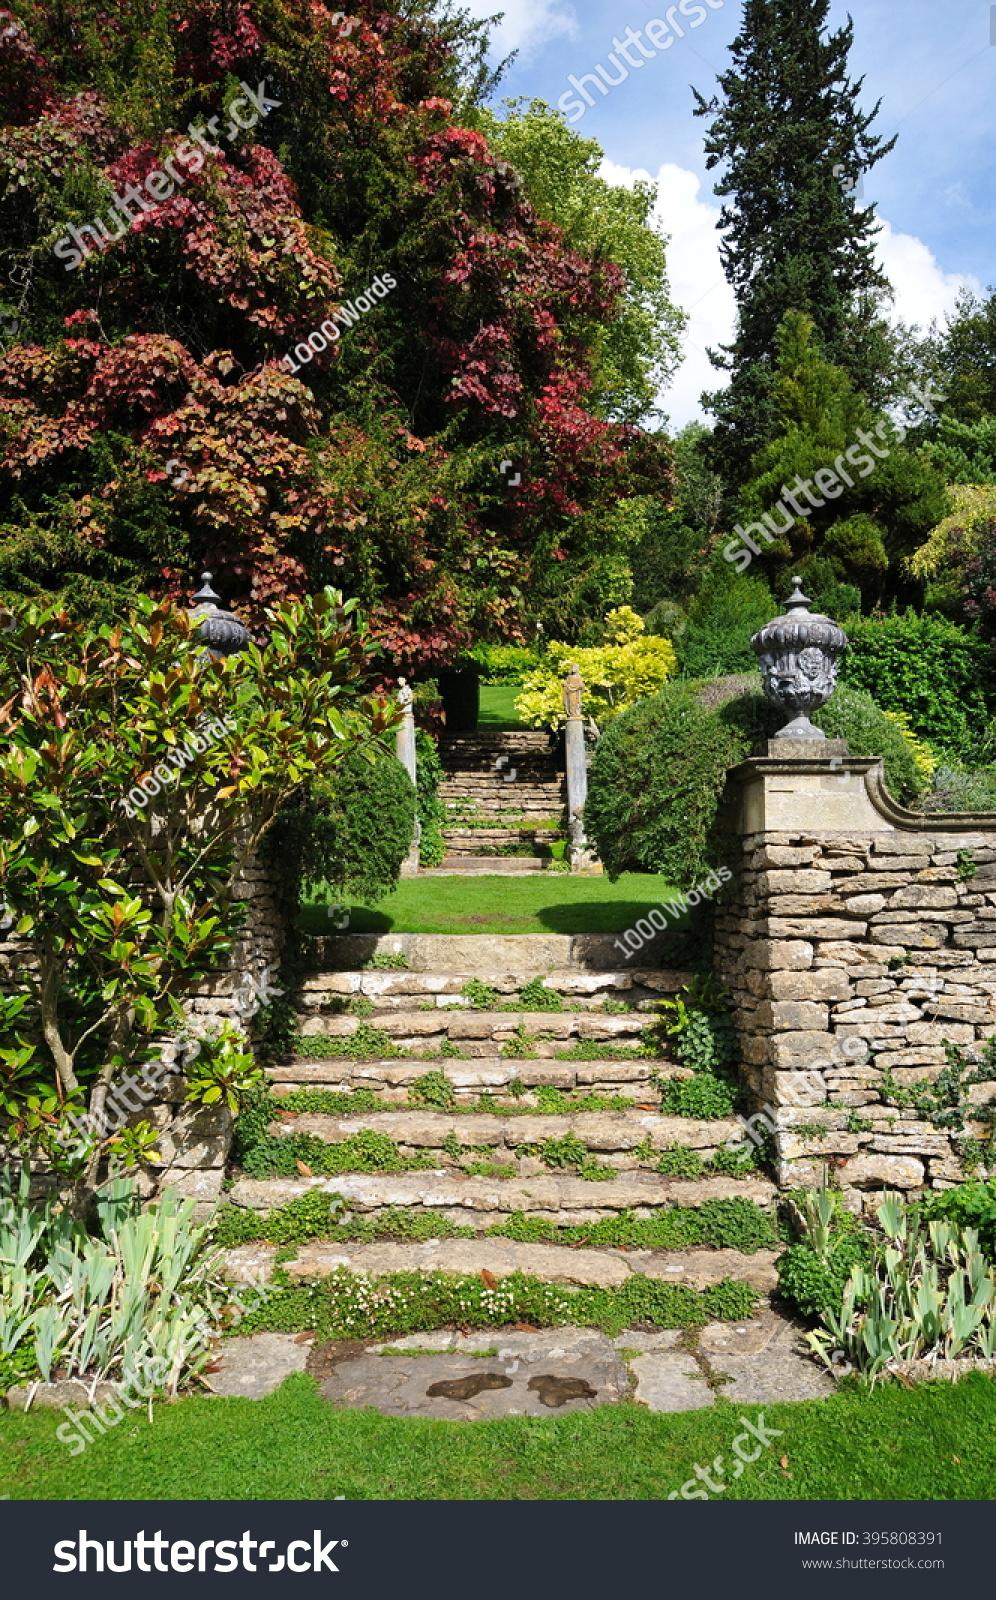 Stone Steps In A Beautiful English Landscape Garden